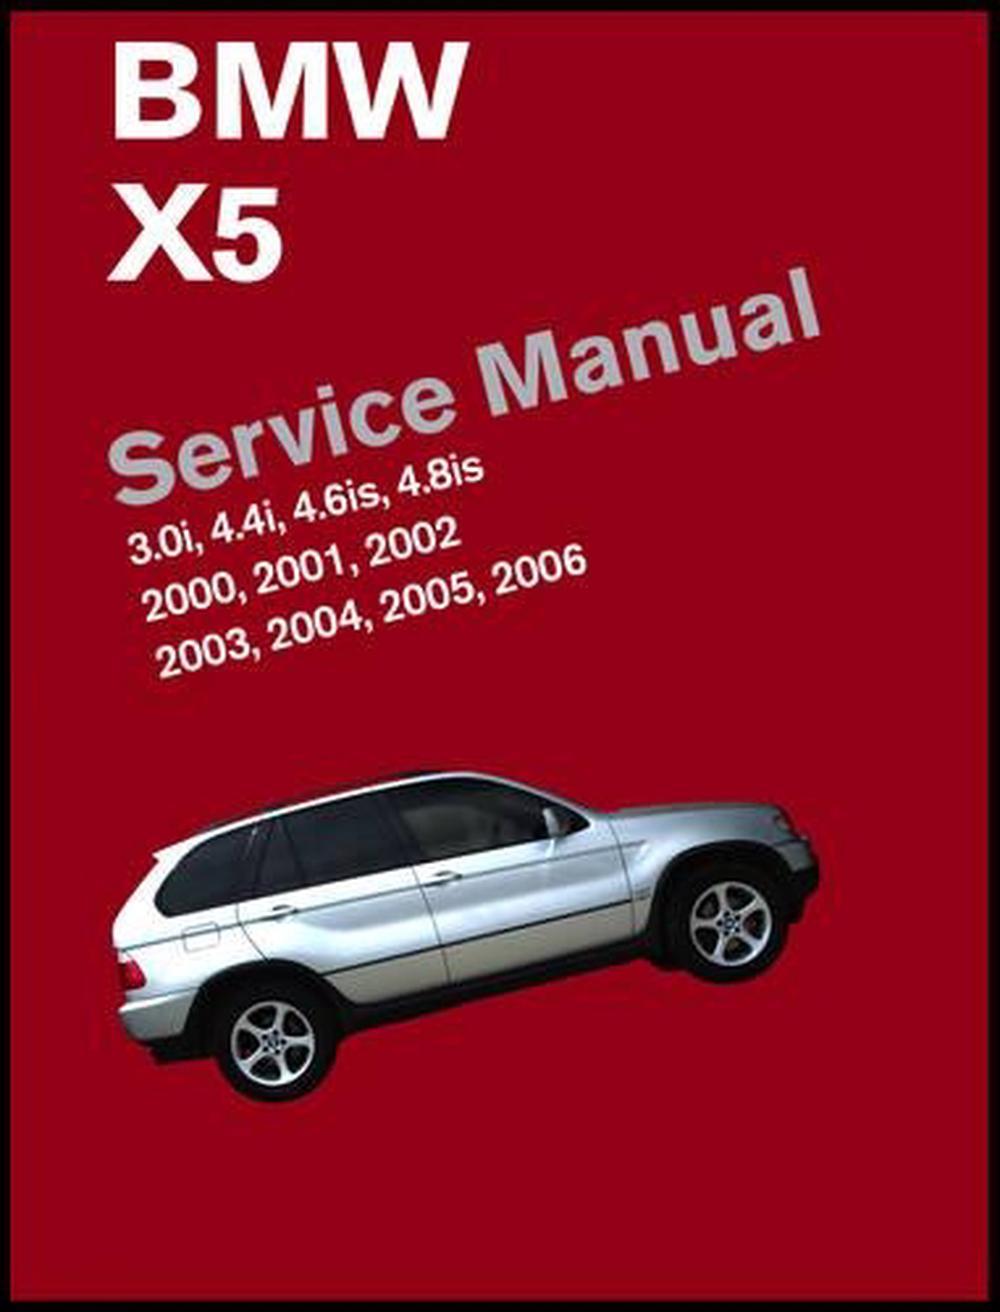 medium resolution of bmw x5 e53 service manual 2000 2001 2002 2003